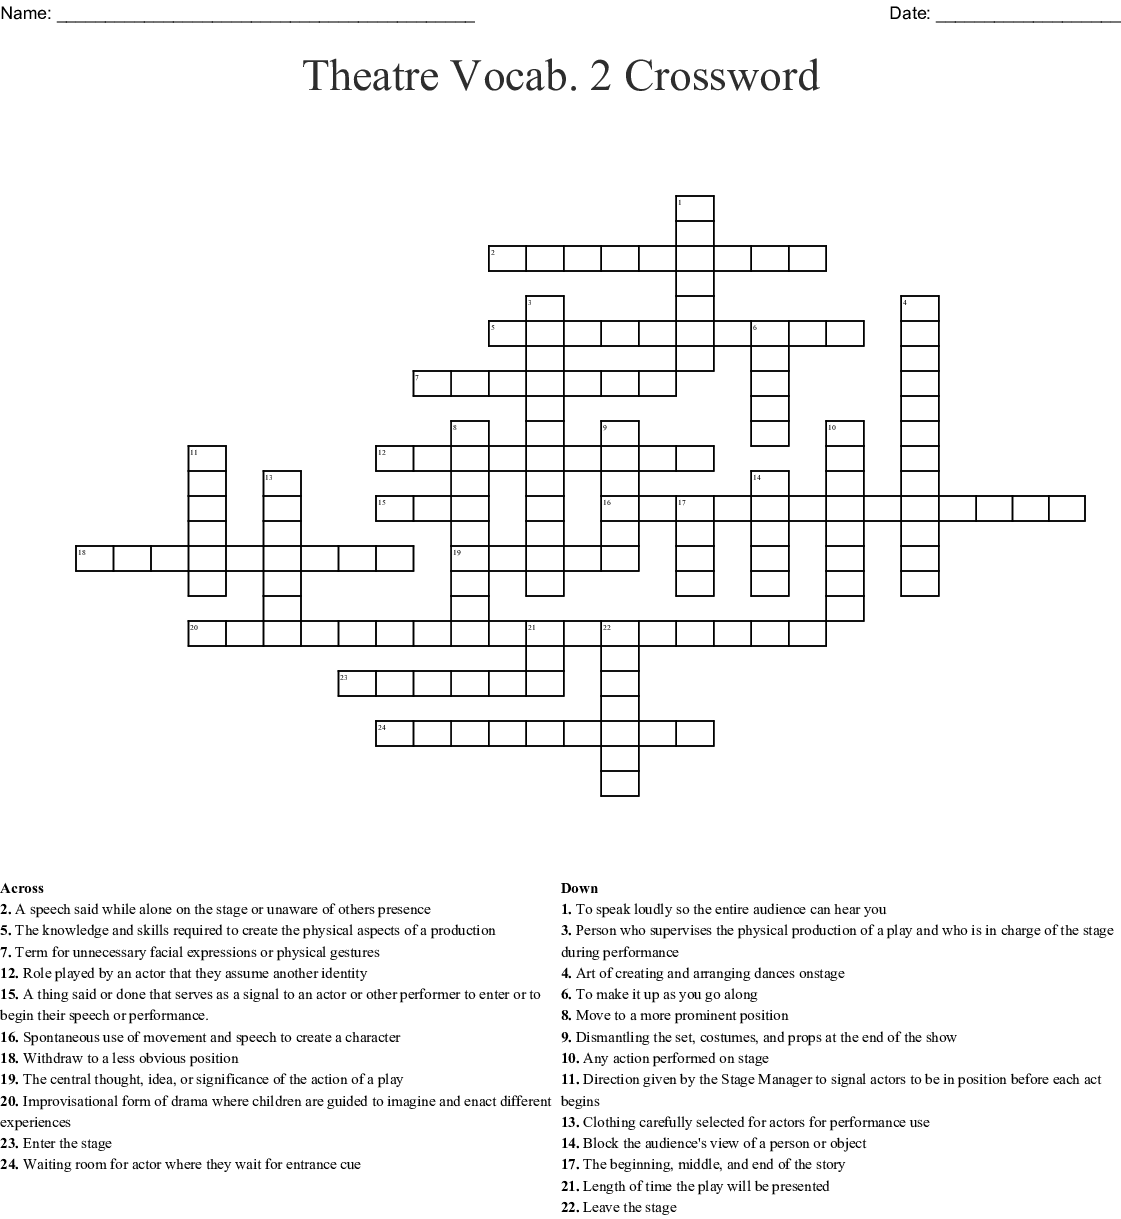 Theatre Vocabulary Crossword Wordmint